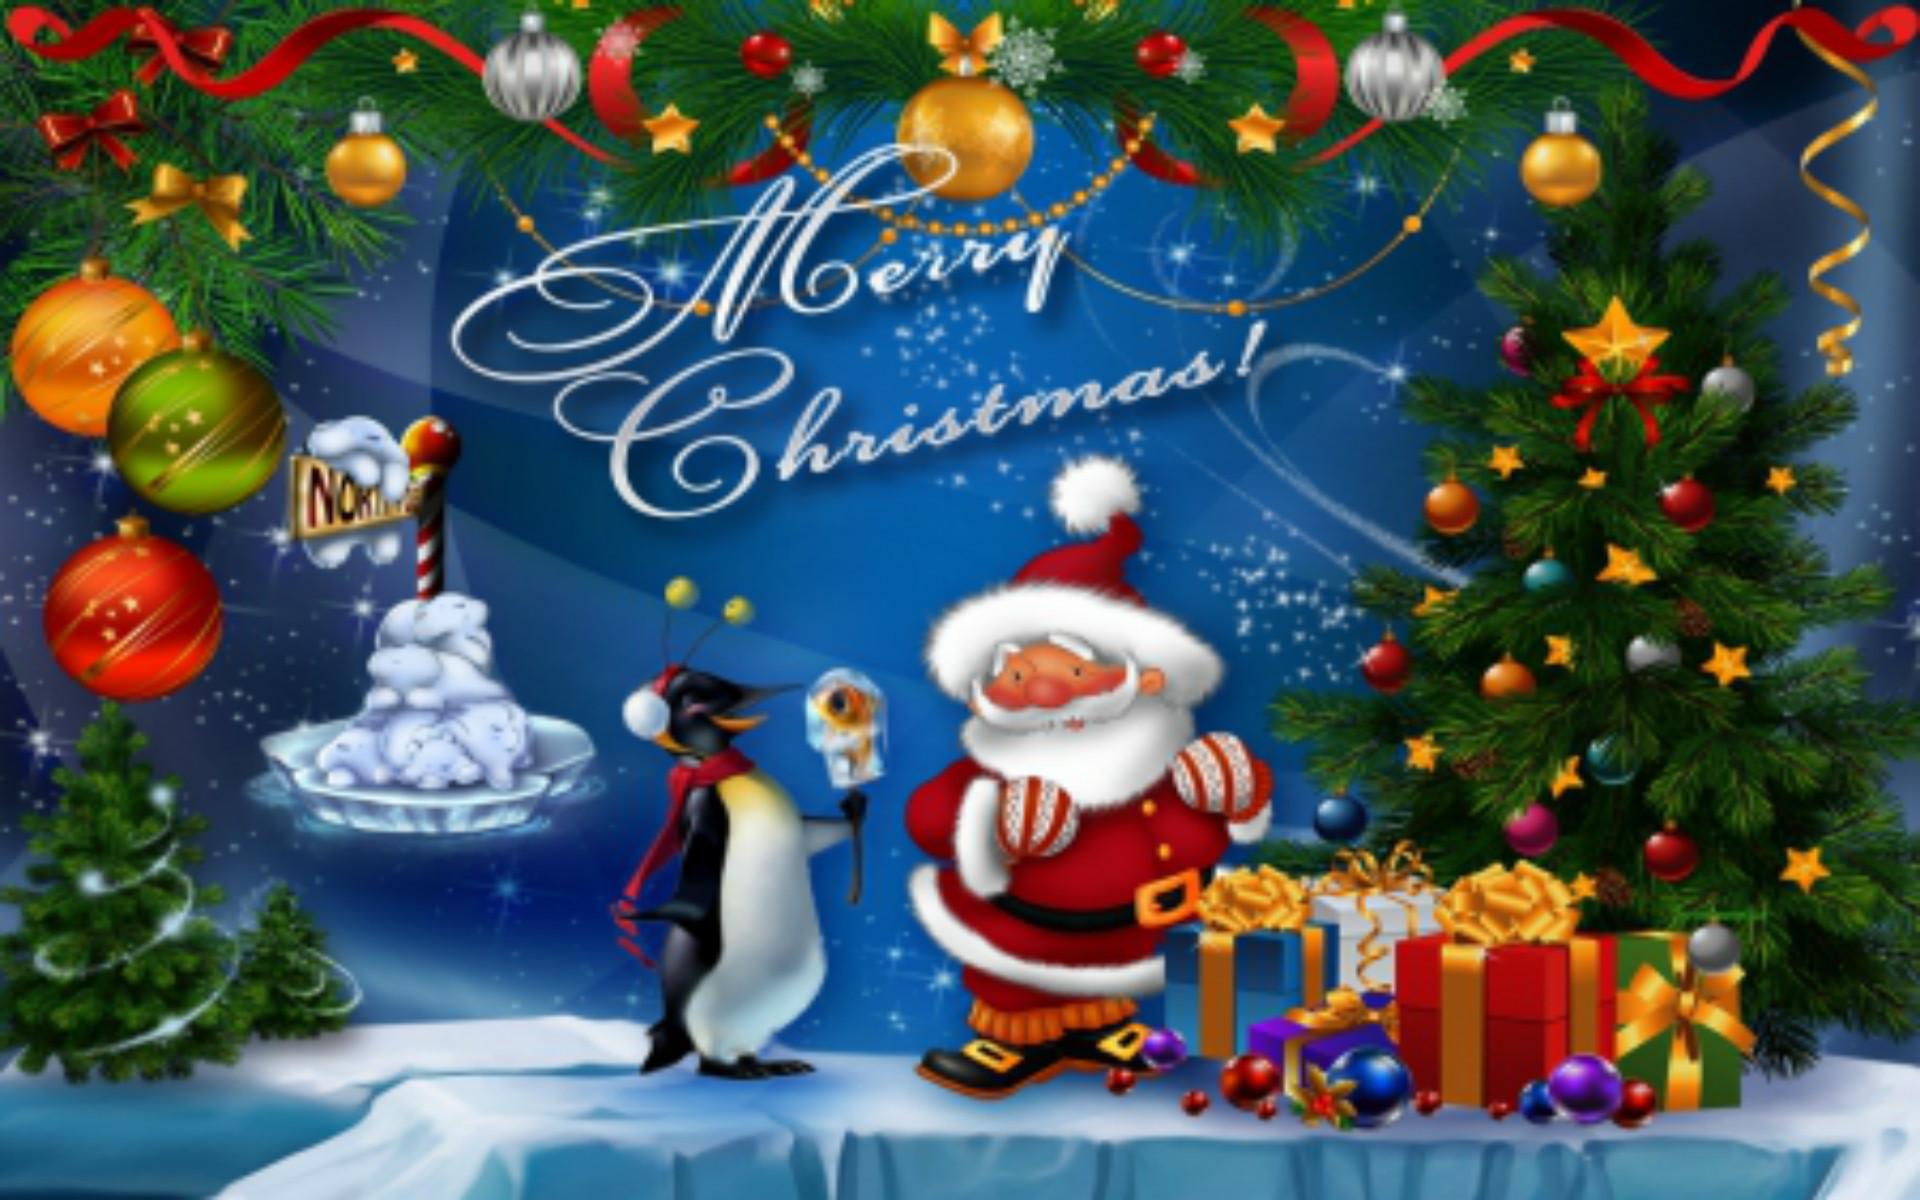 Christmas Tree Desktop Background 74 images 1920x1200